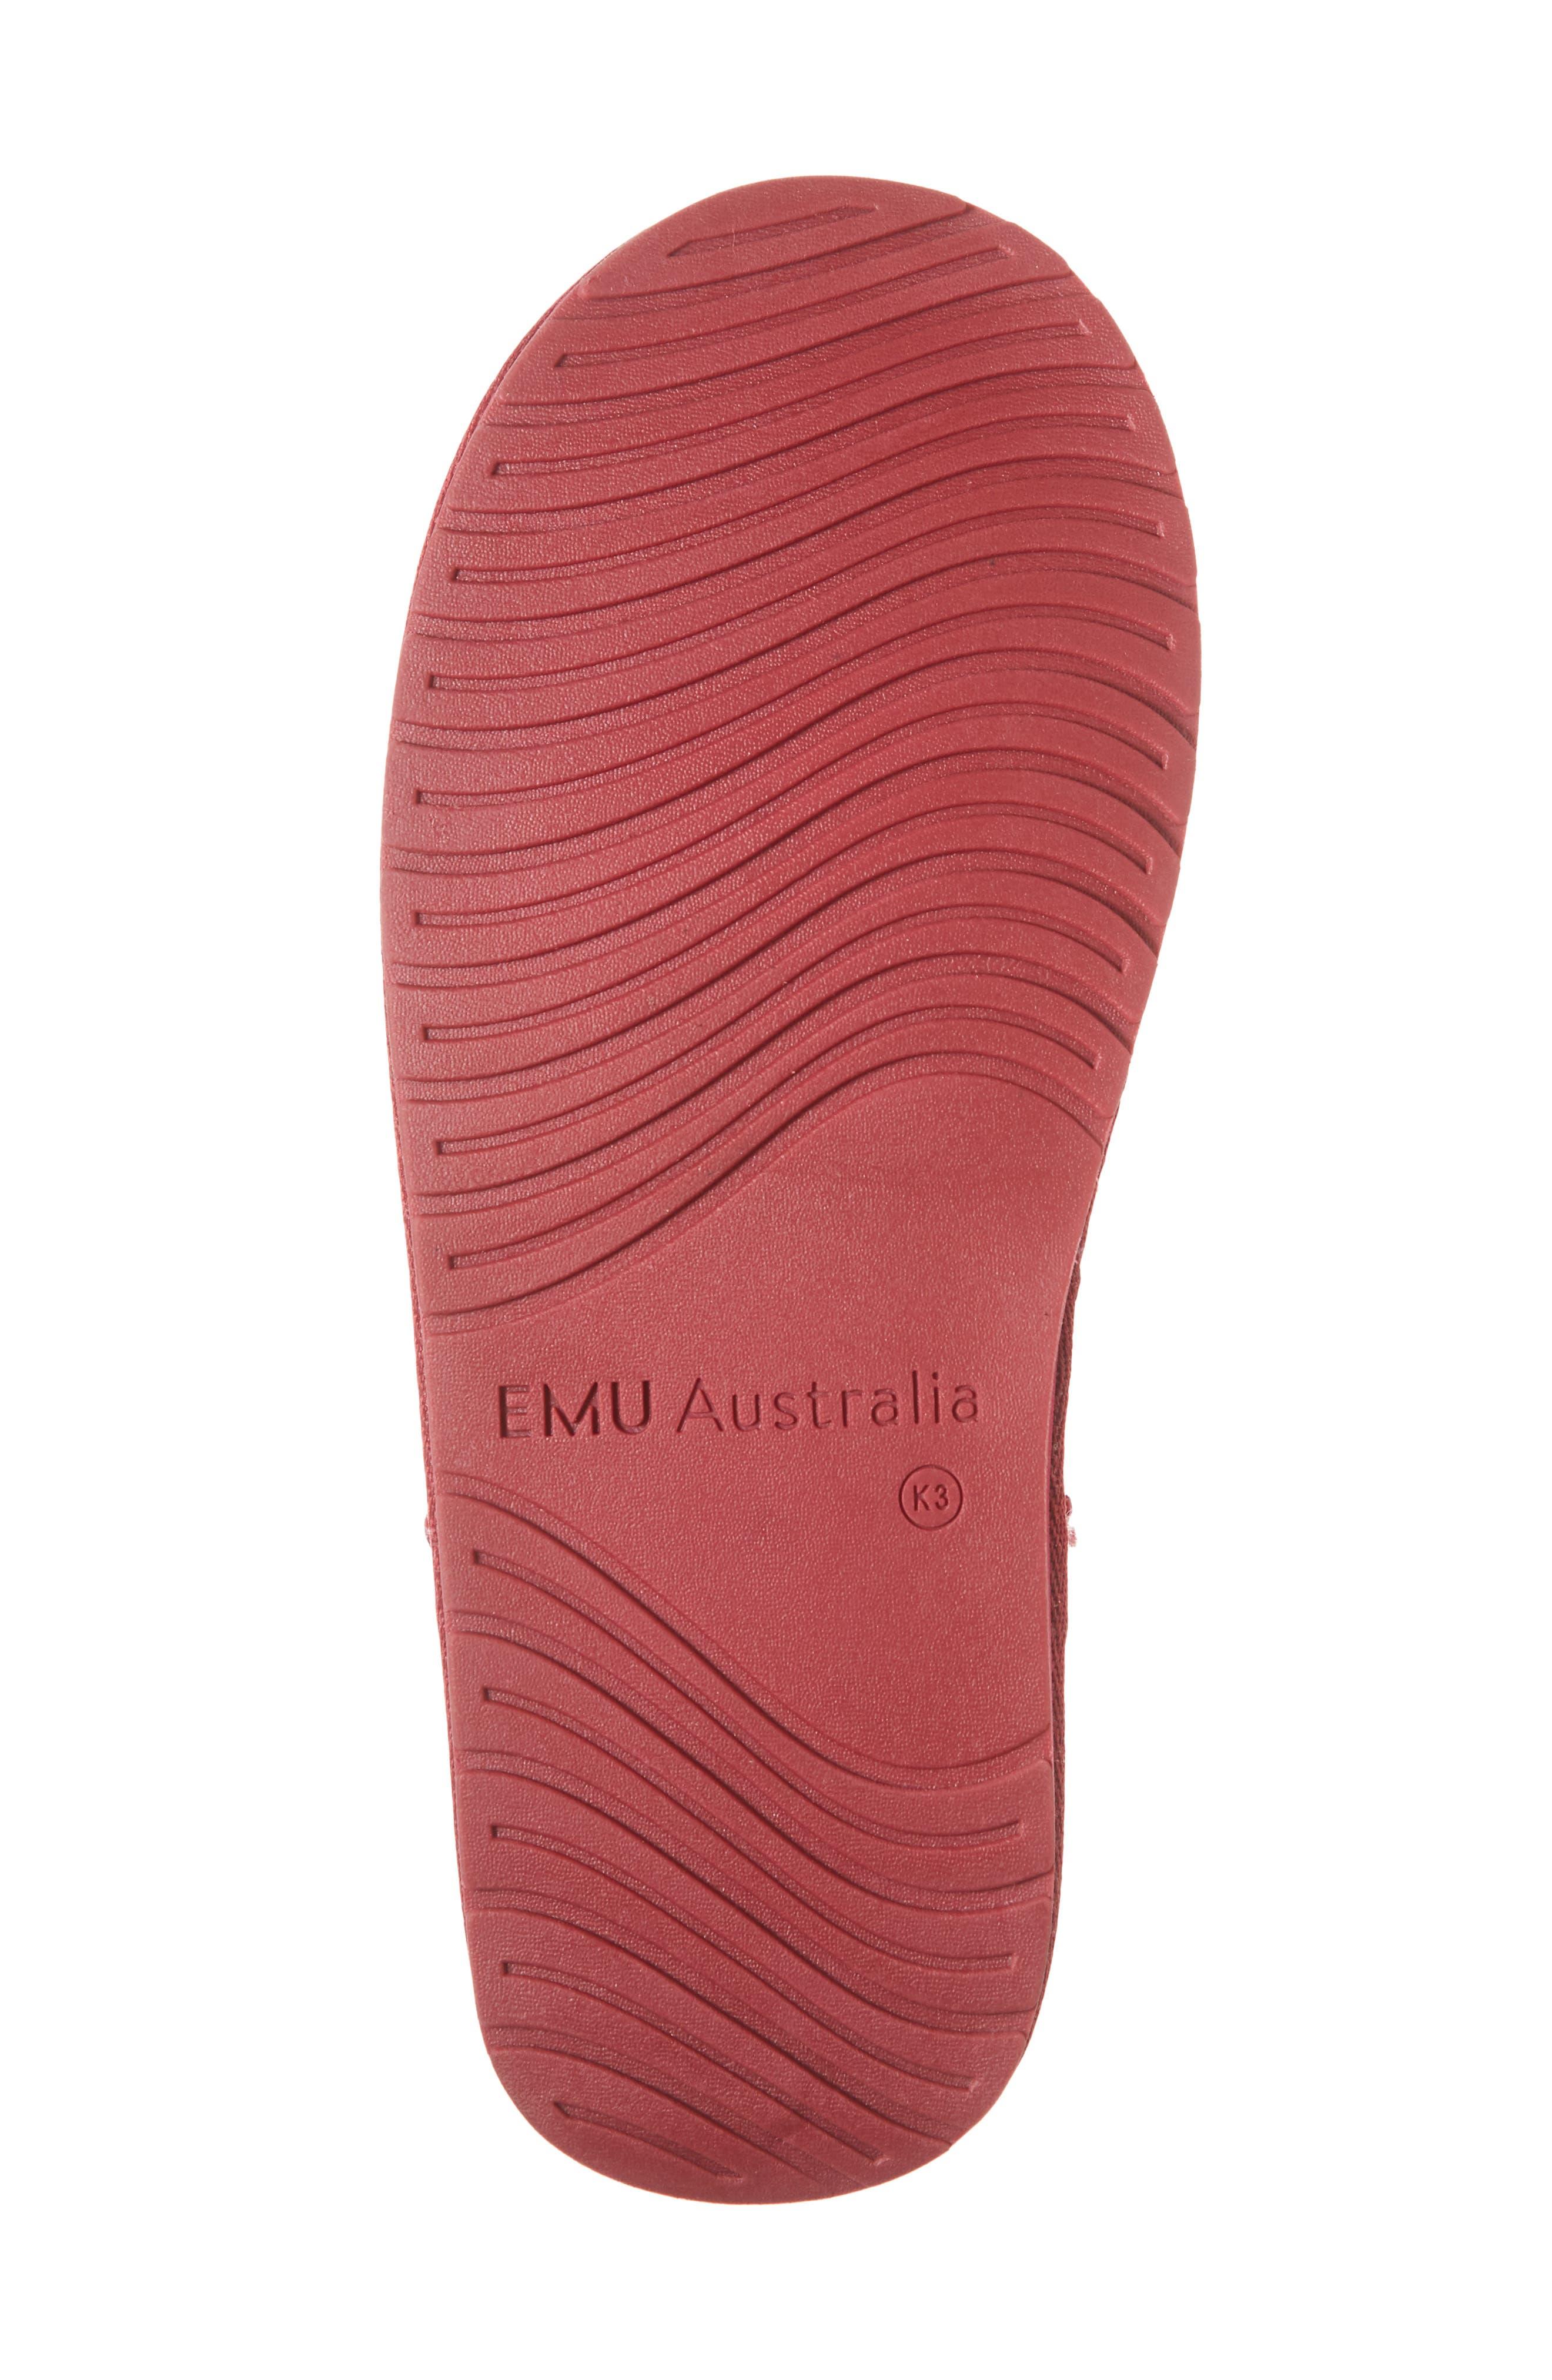 EMUAustralia Starry Night Boot,                             Alternate thumbnail 4, color,                             Fuchsia